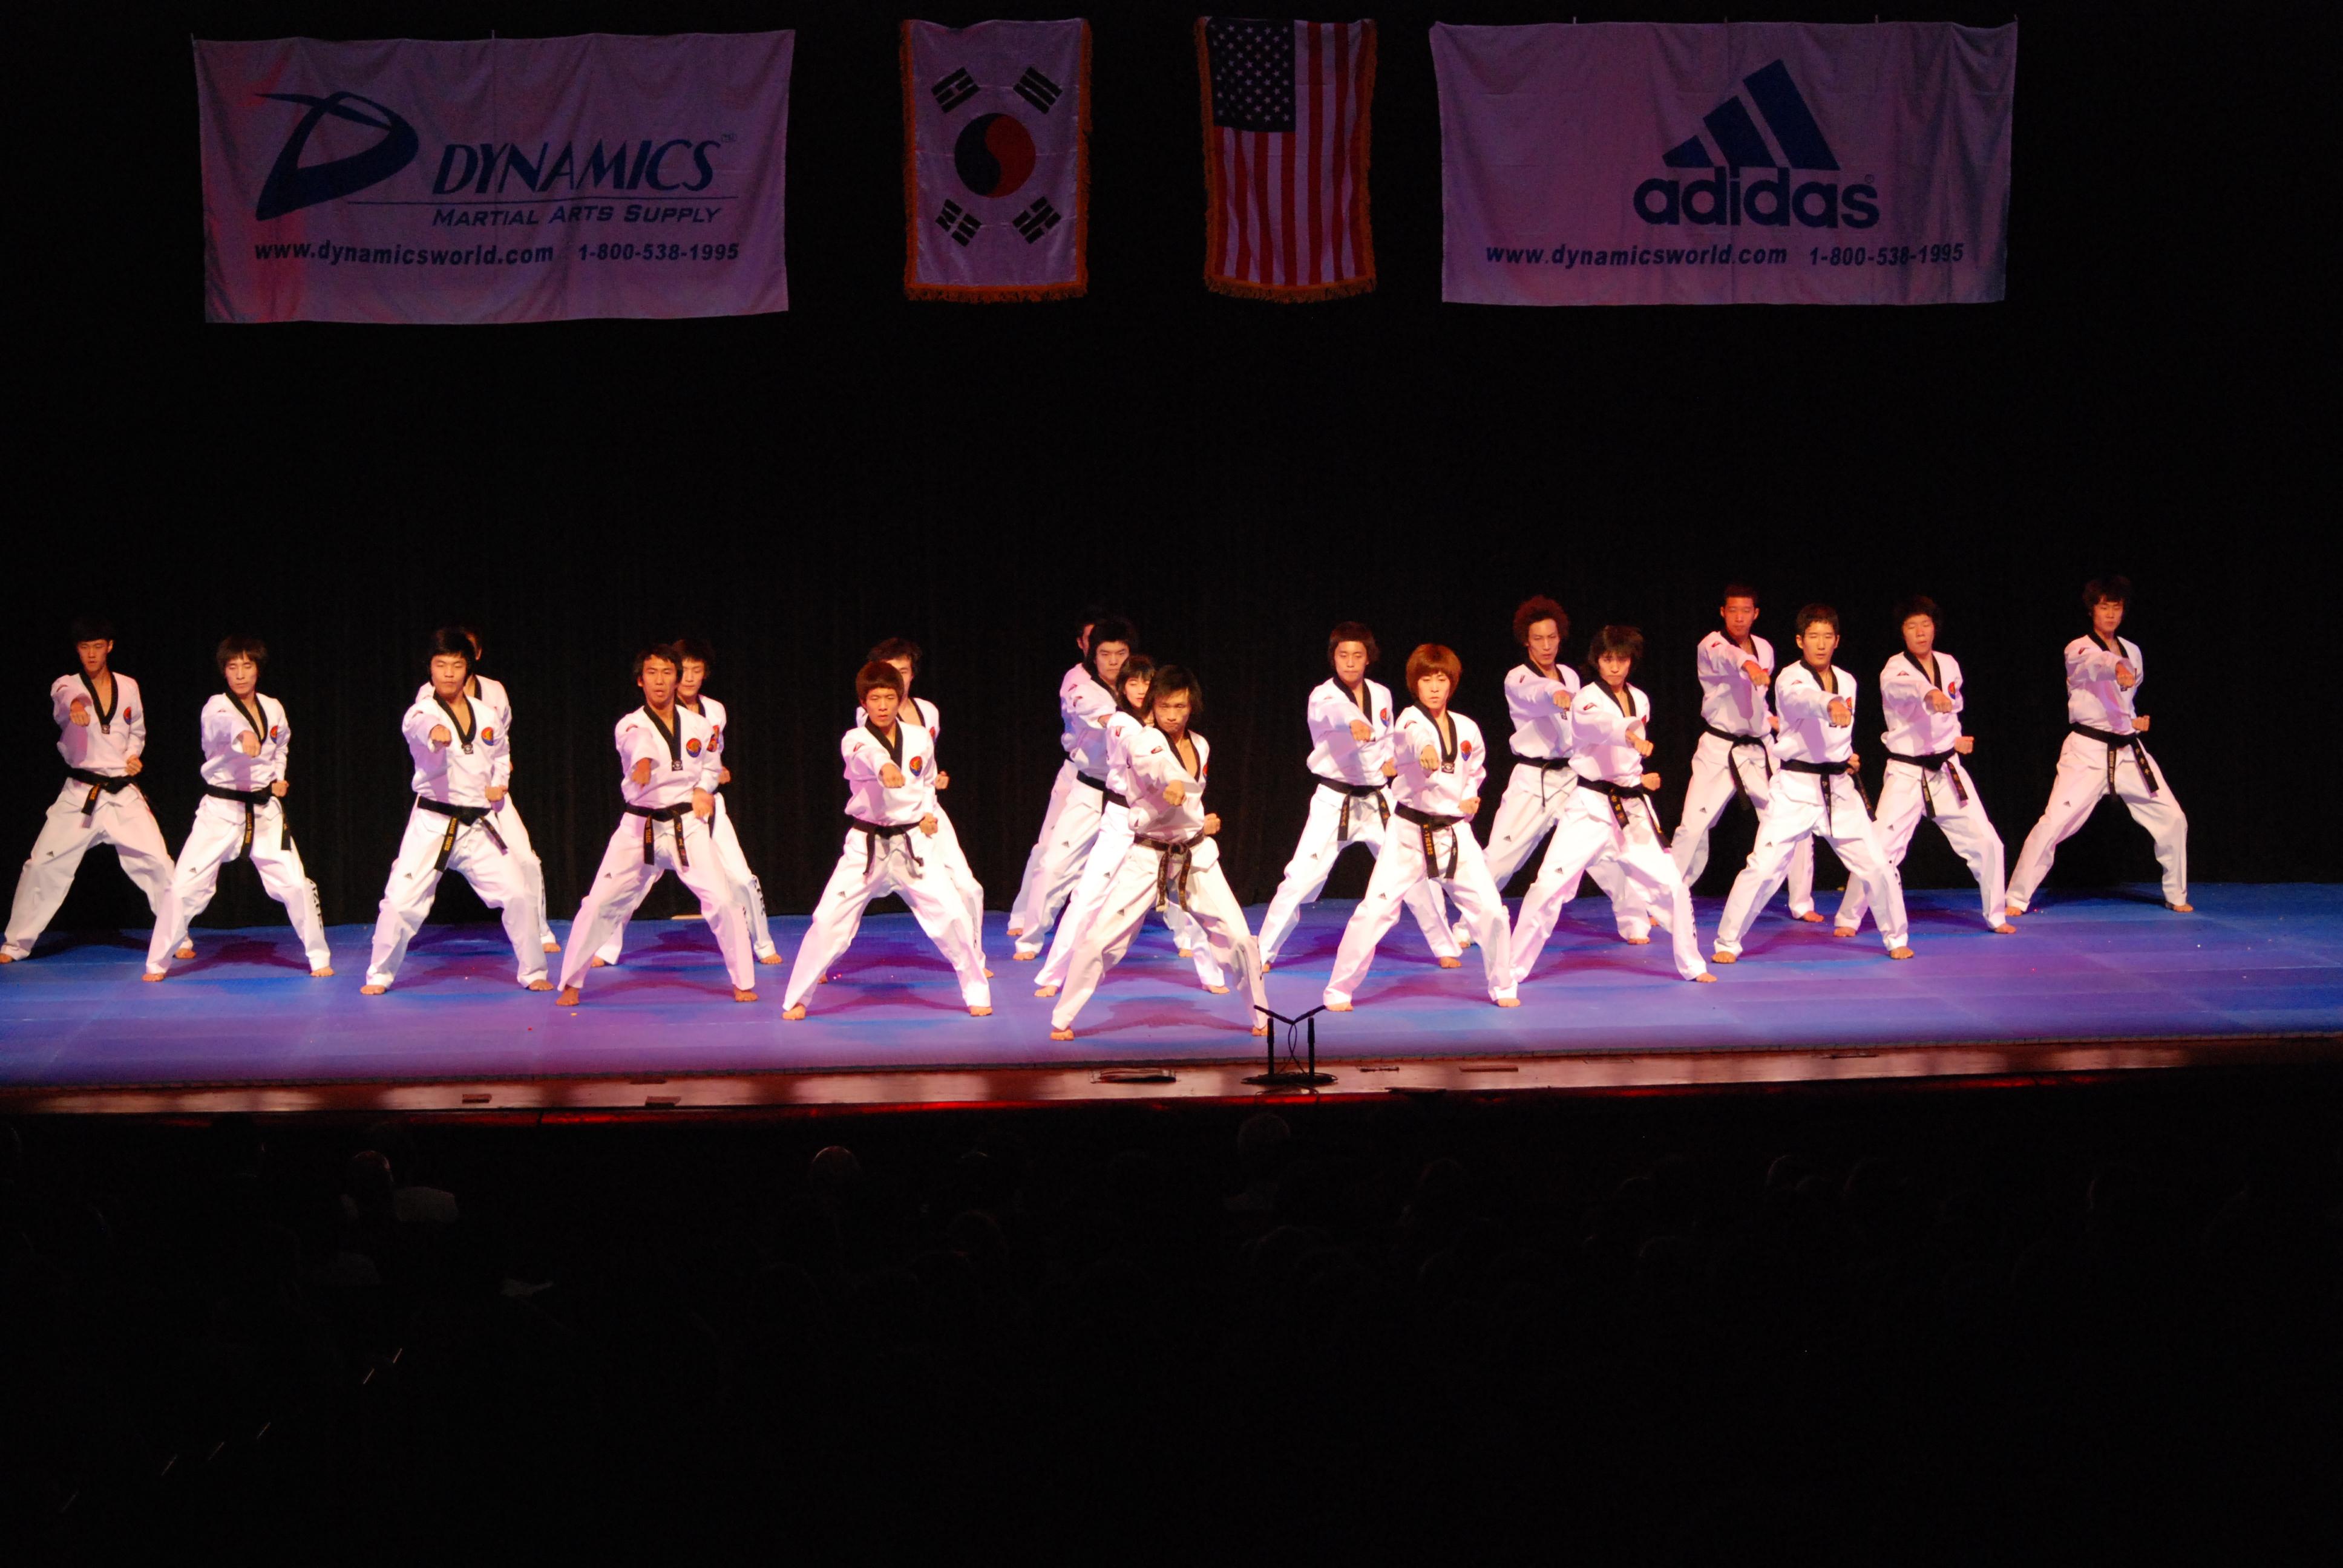 club taekwondo performance